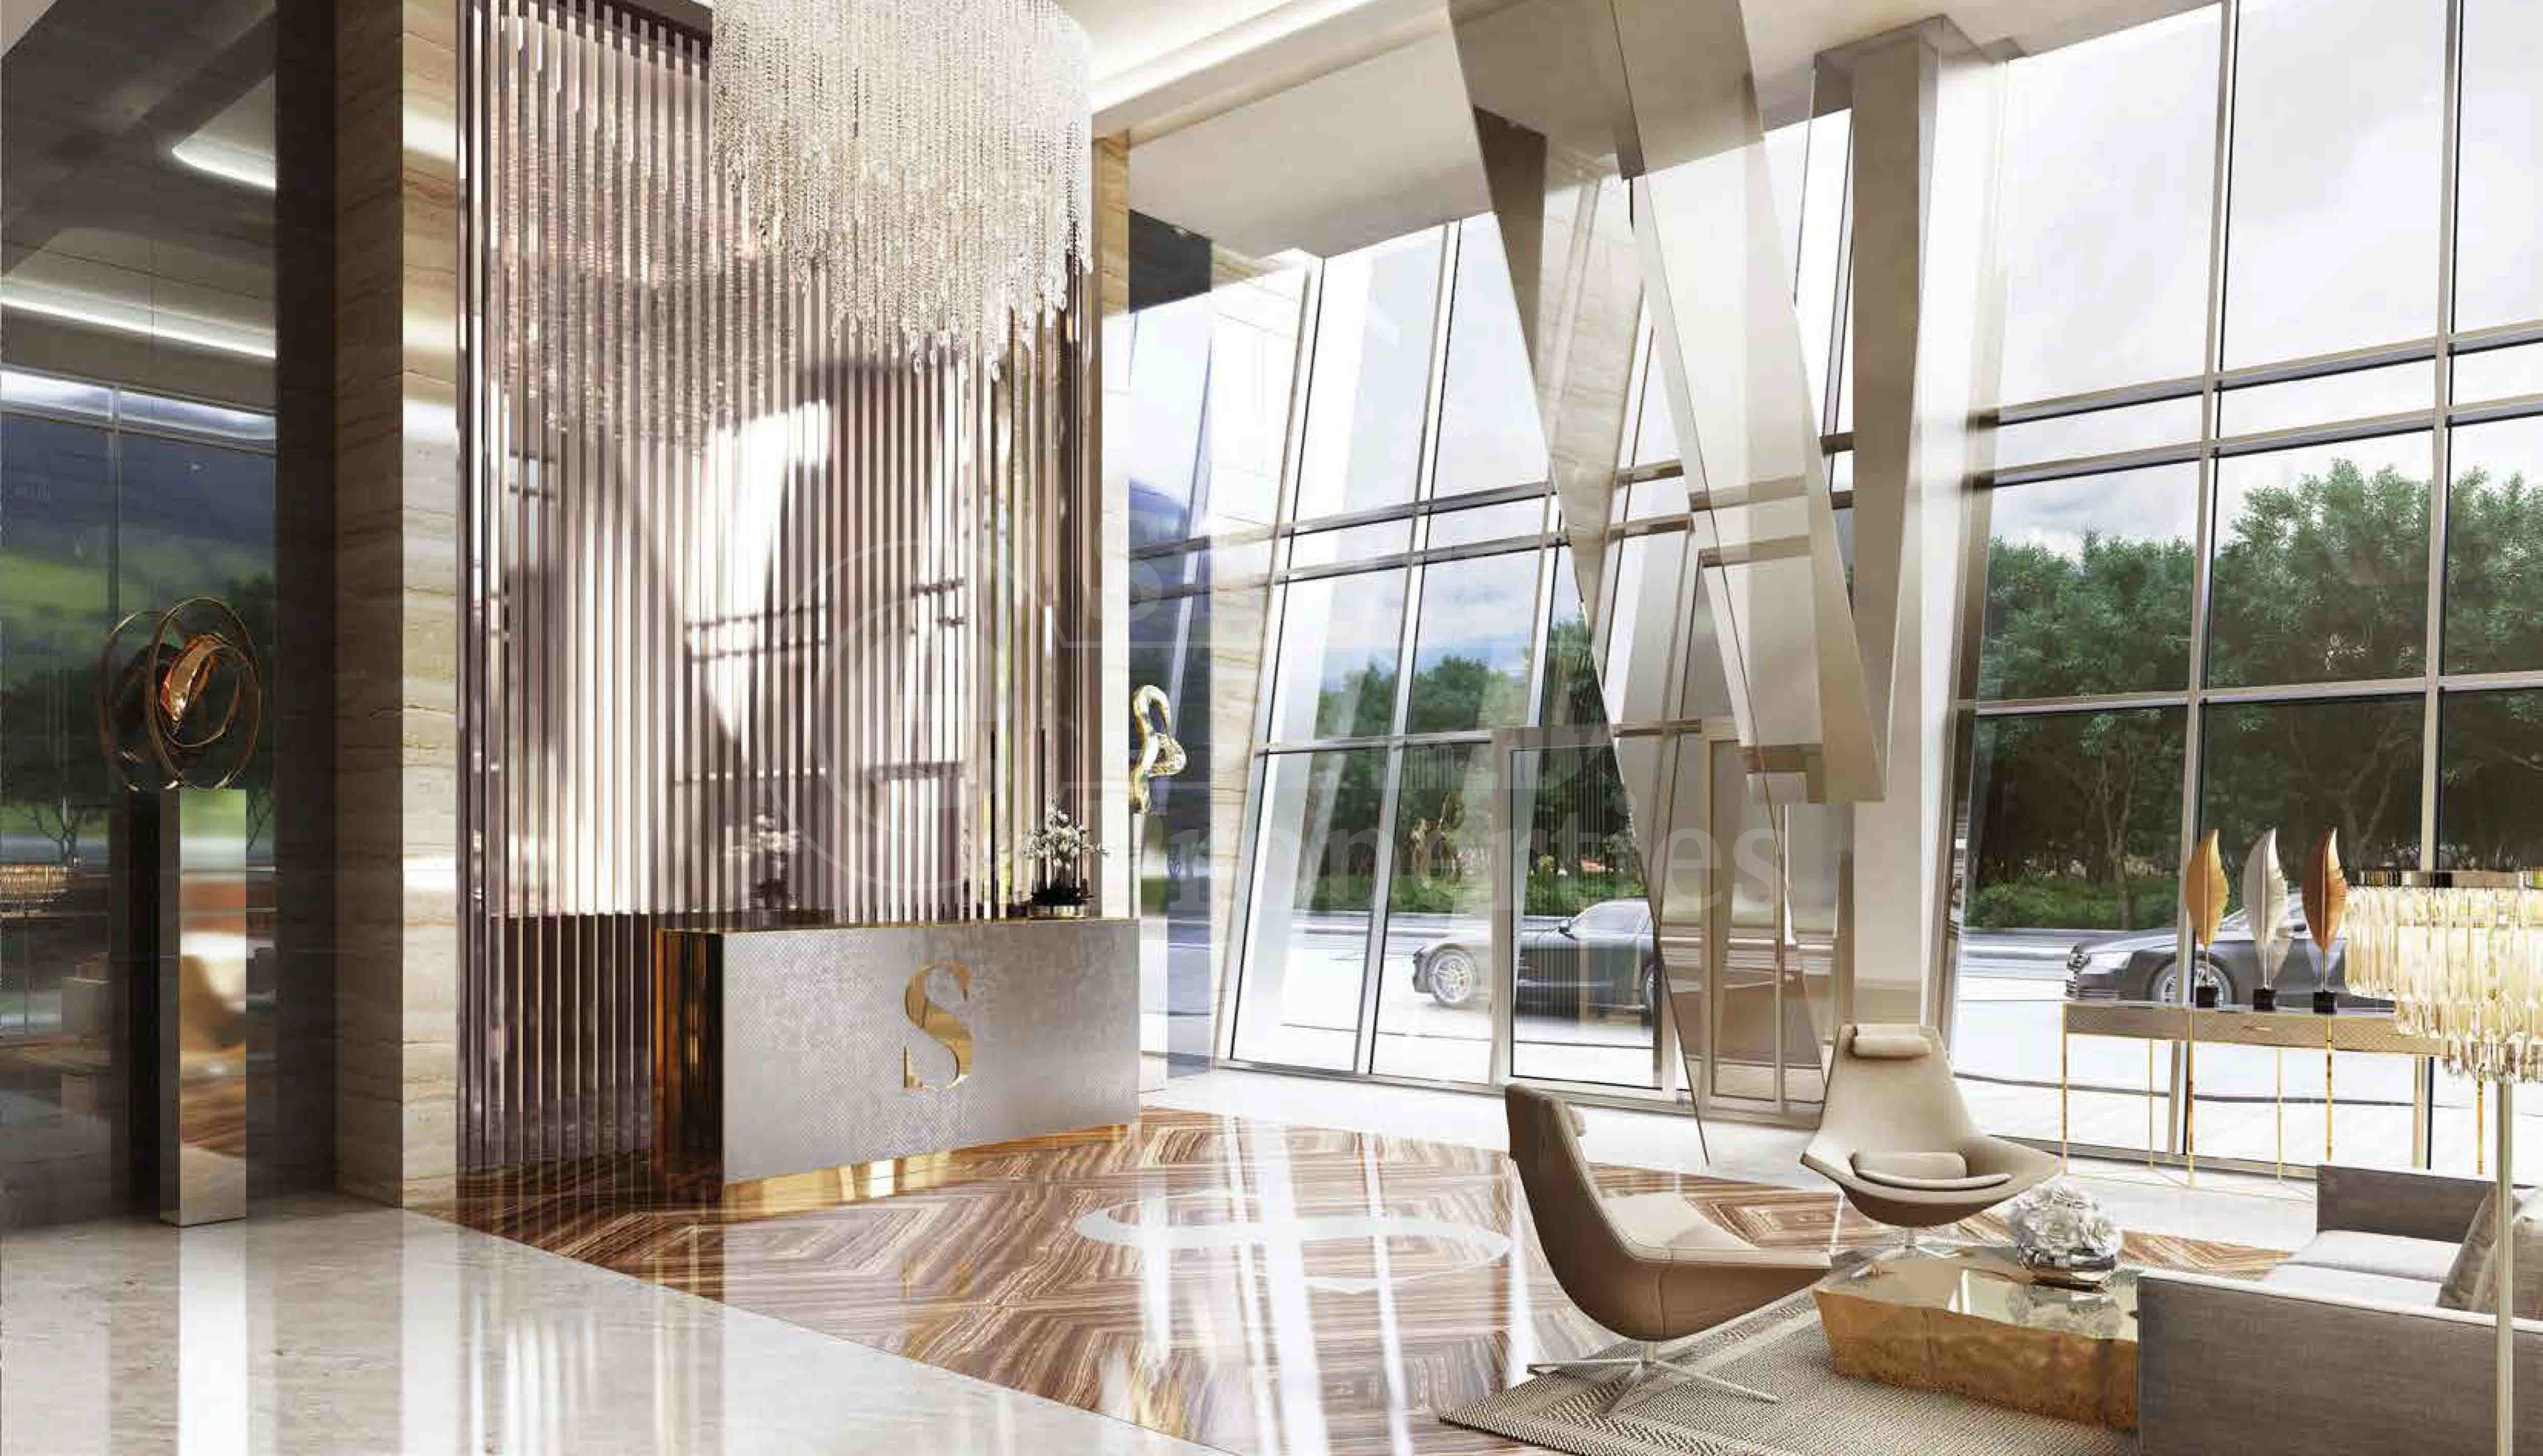 UPDATED : How the Burj Khalifa was built (including design) Burj khalifa rooms pictures